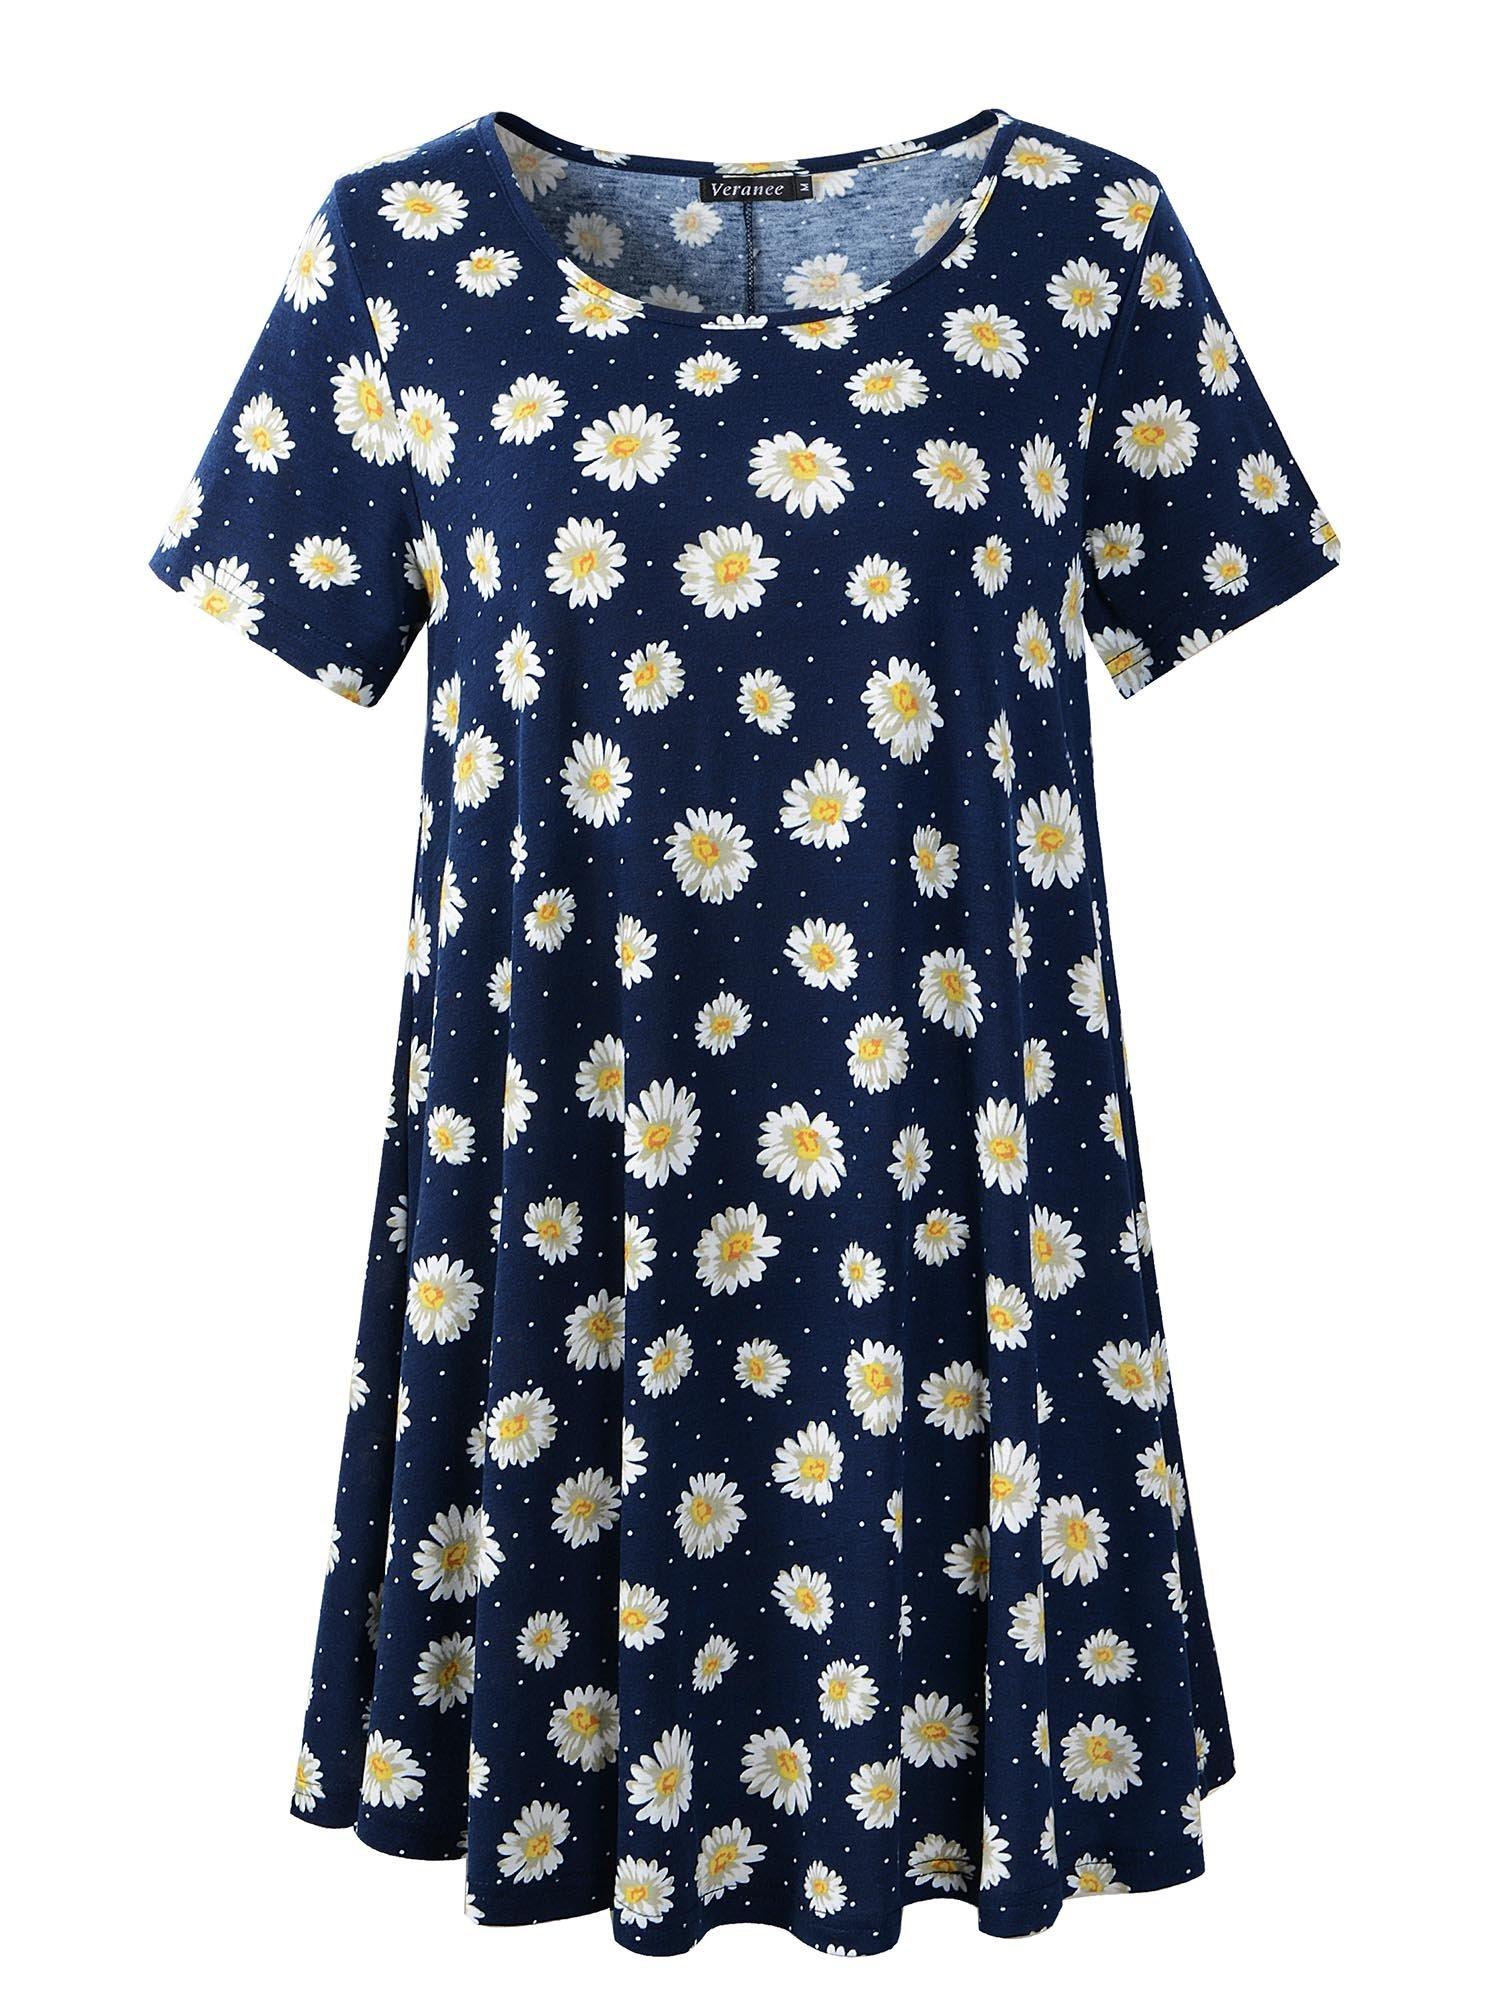 e2d42a45f Galleon - Veranee Women's Plus Size Swing Tunic Top Short Sleeve Floral  Flare T-Shirt (Medium, 56-3)